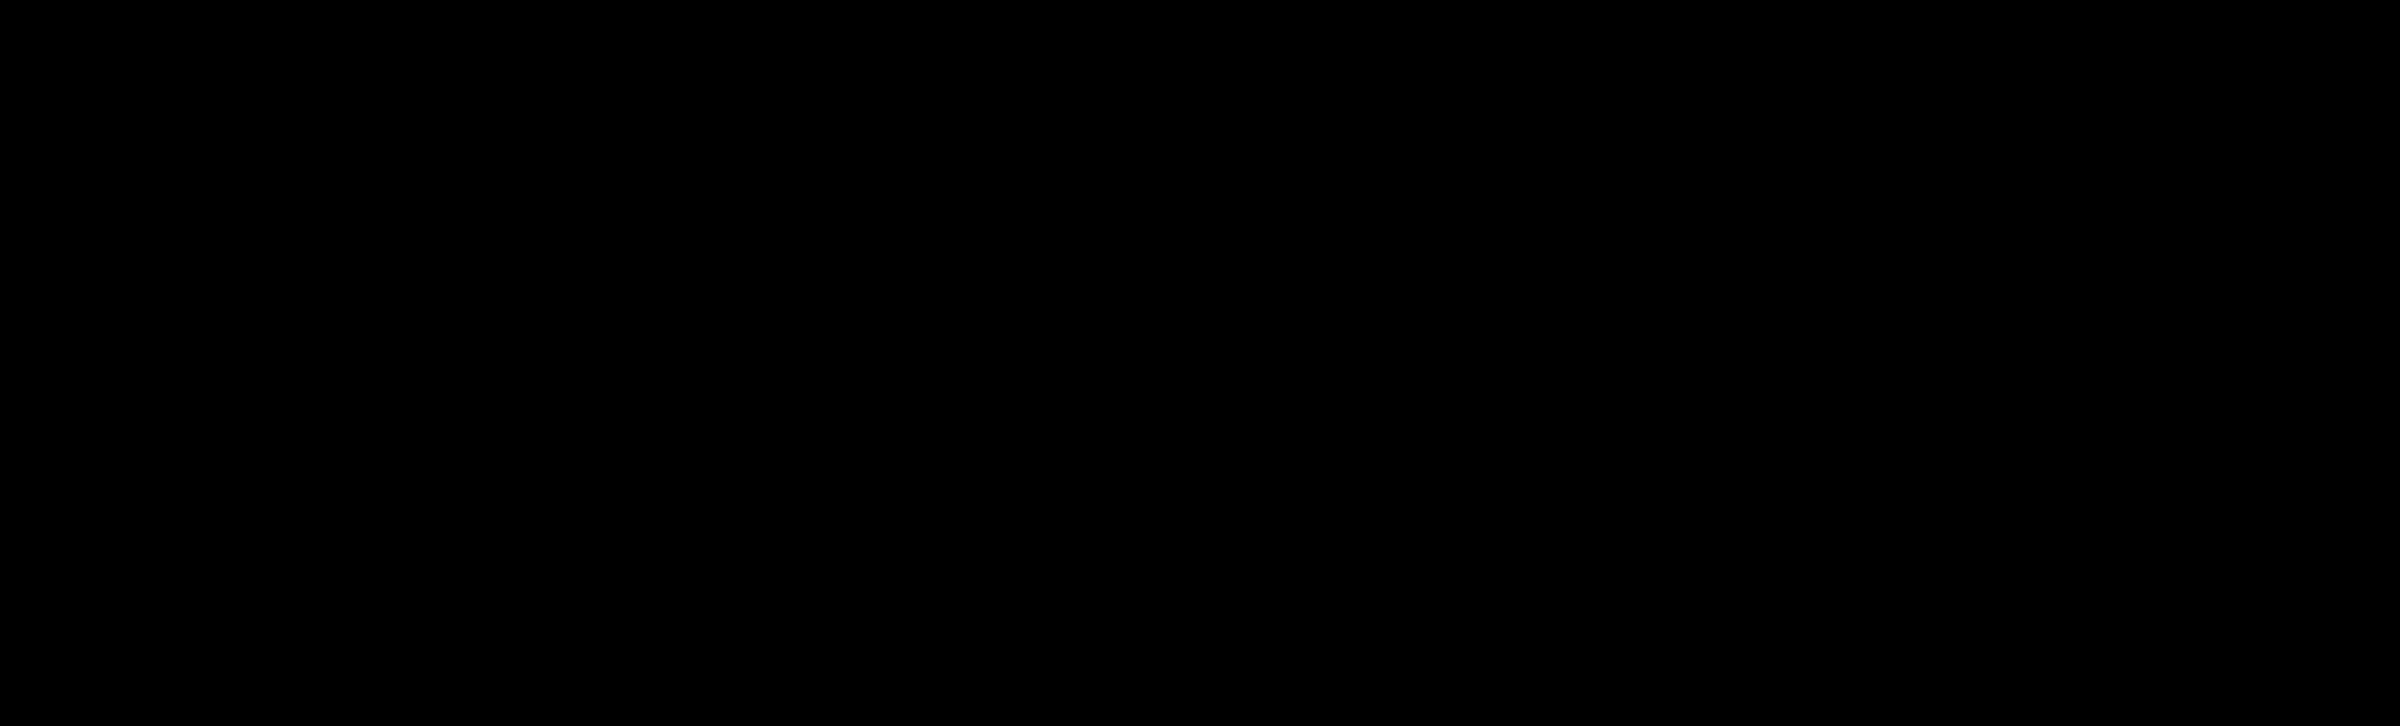 2400x726 Clipart